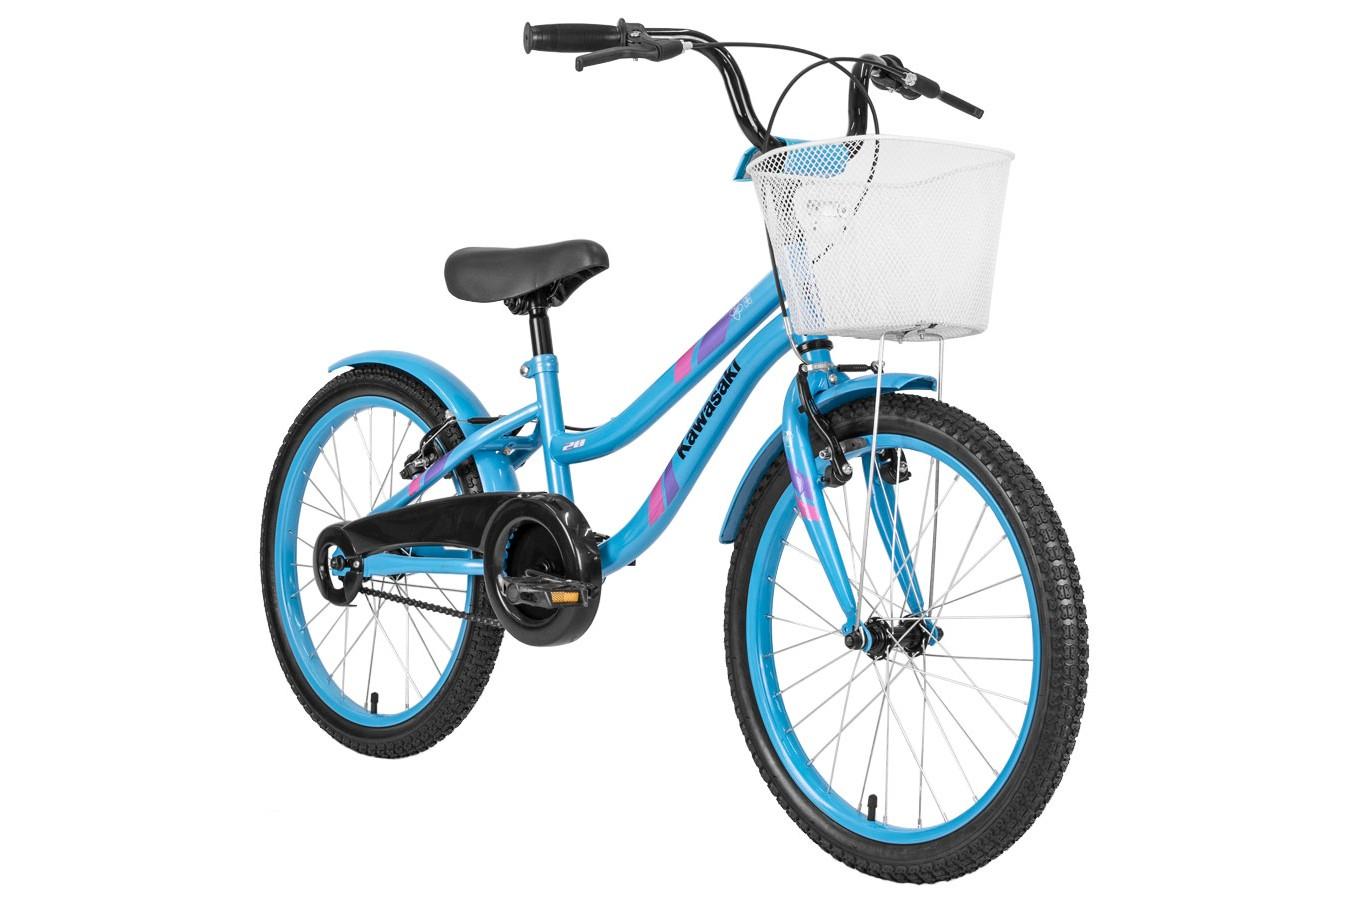 Bicicleta aro 20 Feminina Azul Tiffany - Kawasaki